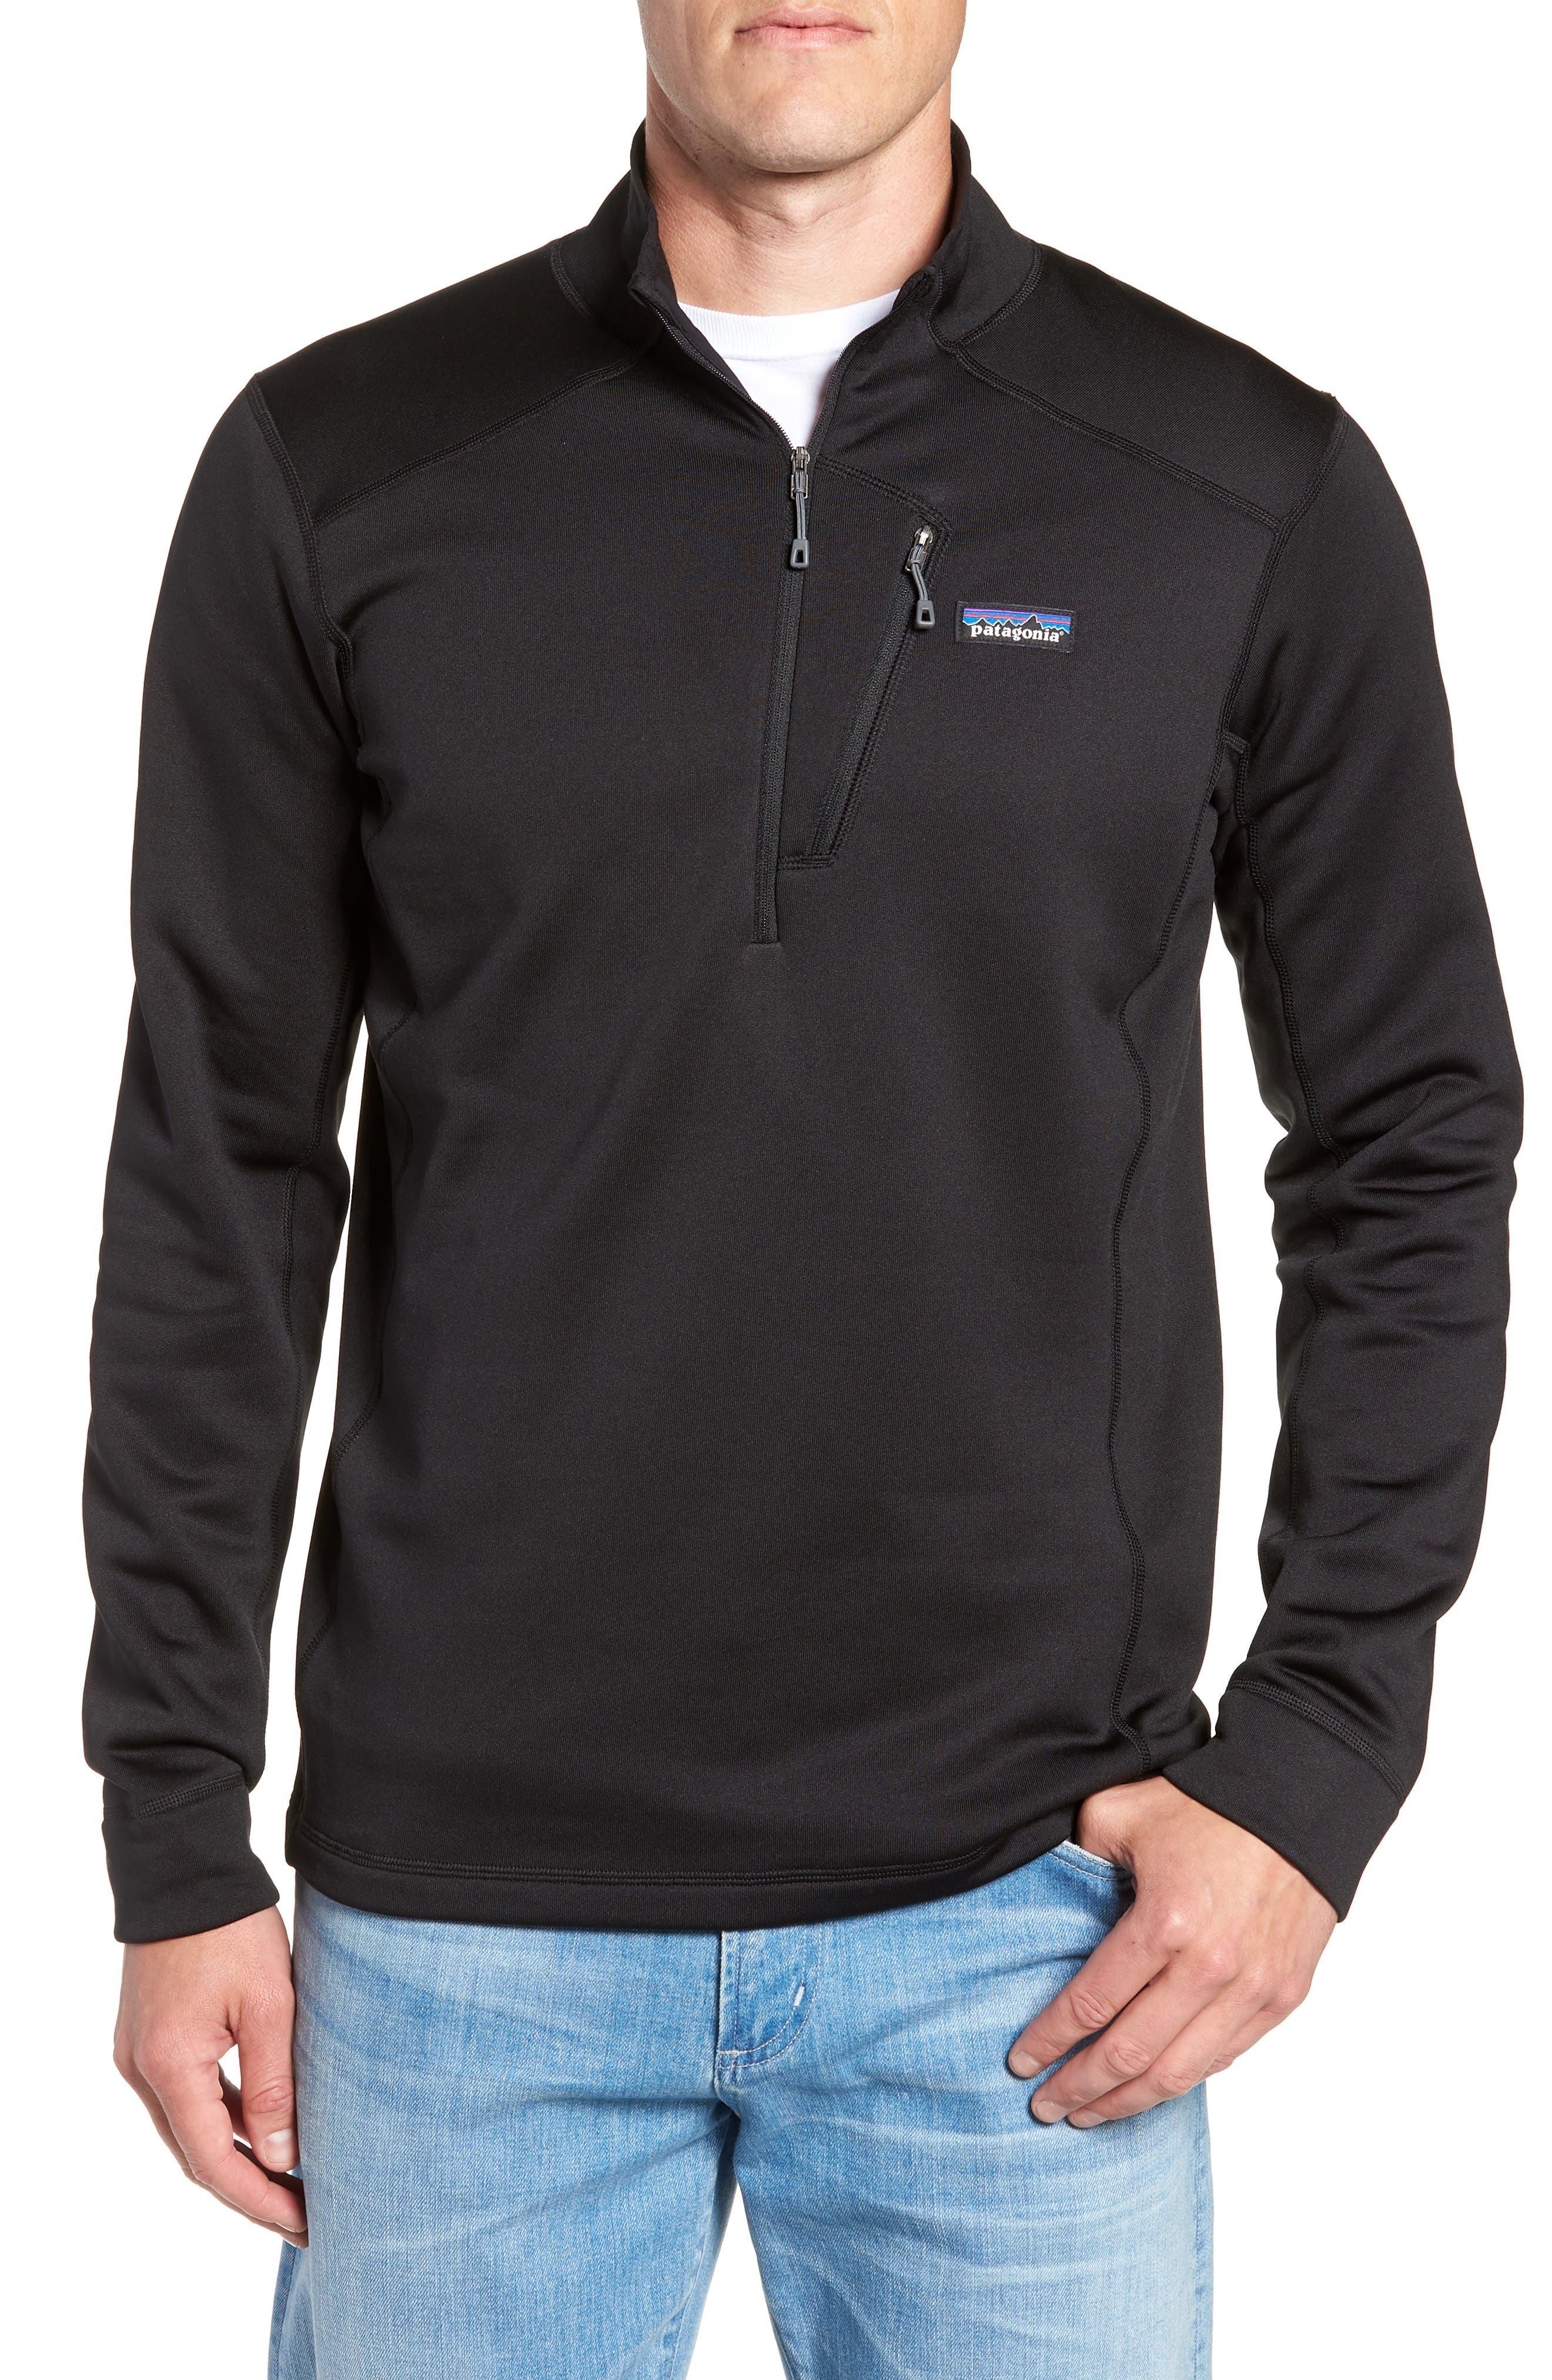 Crosstrek Quarter Zip Fleece Pullover,                             Main thumbnail 1, color,                             001